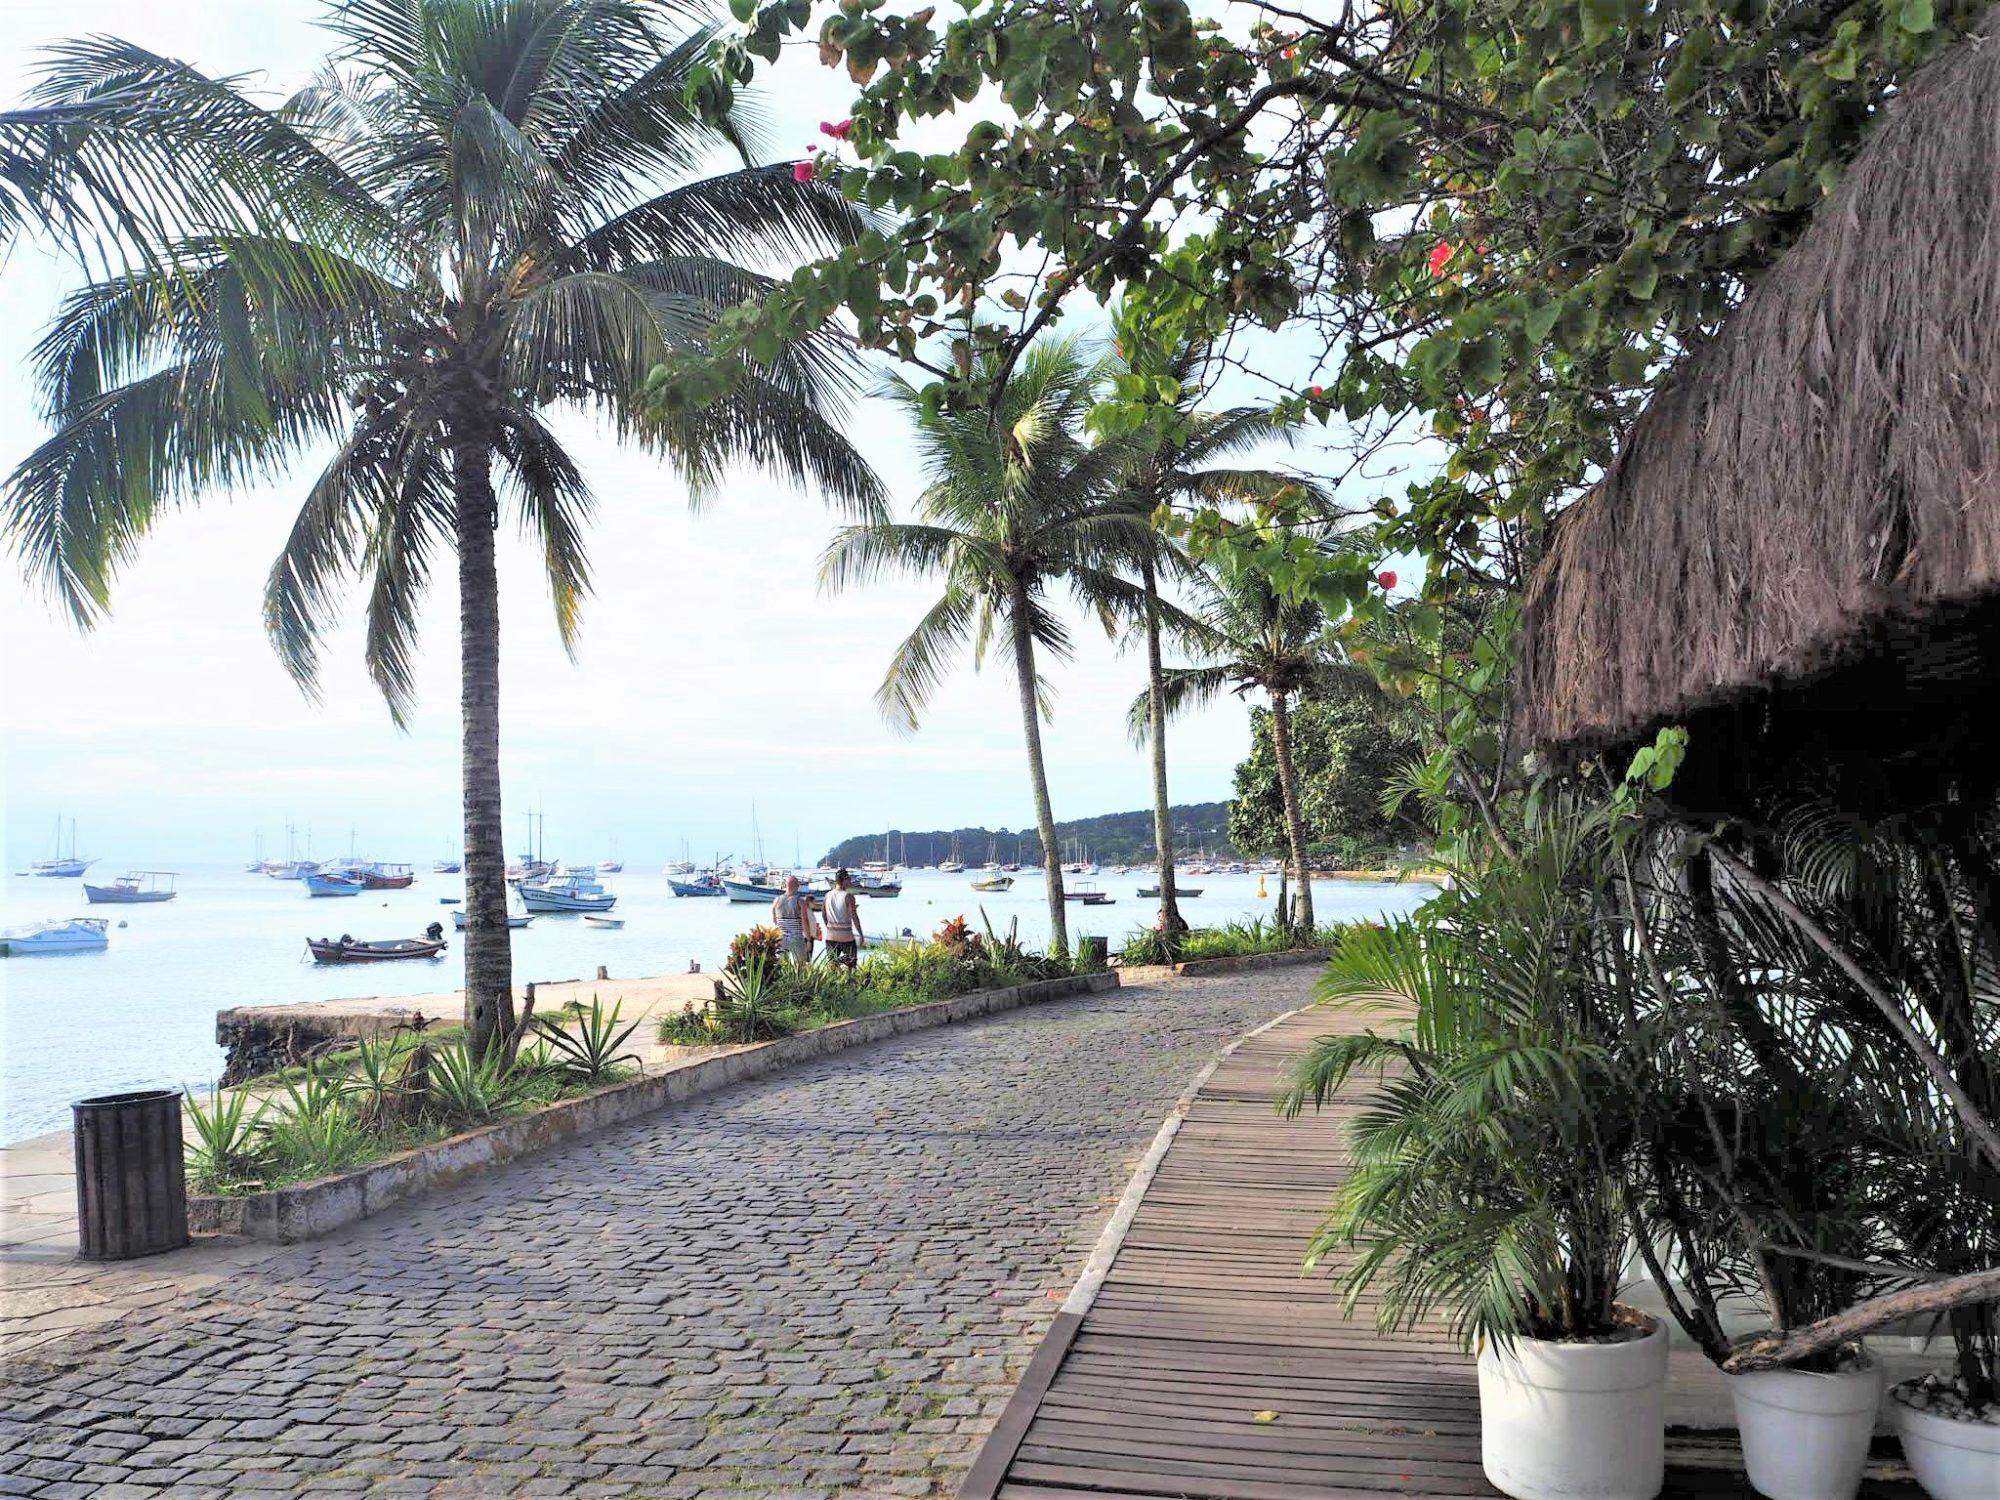 Buzios brésil voyage Eglise clioandco bord de mer encore